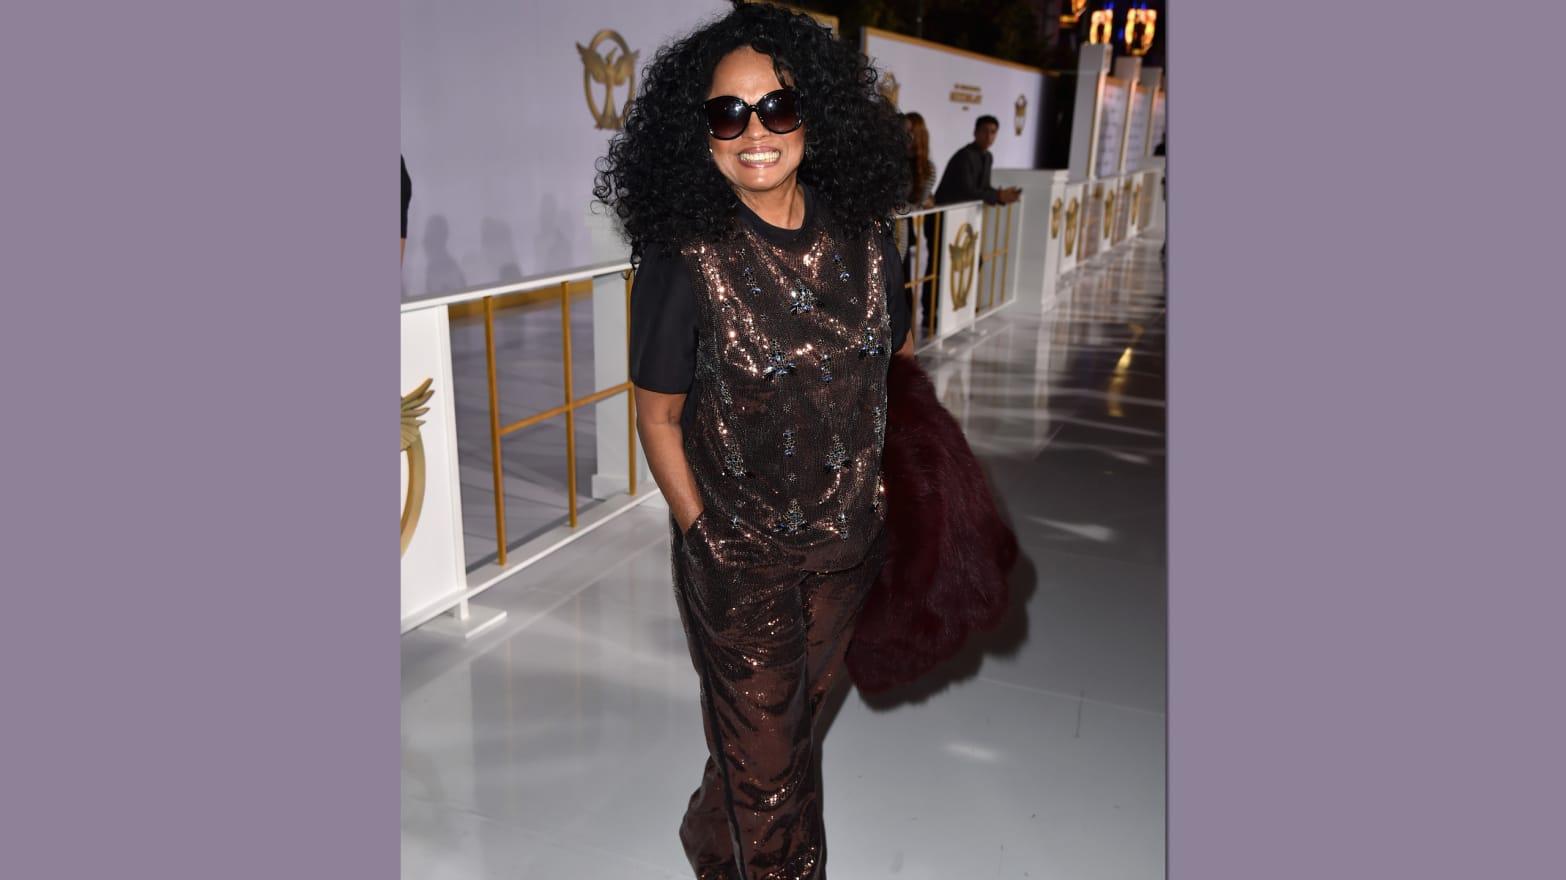 Call Her Miss Ross, Fashion Superstar